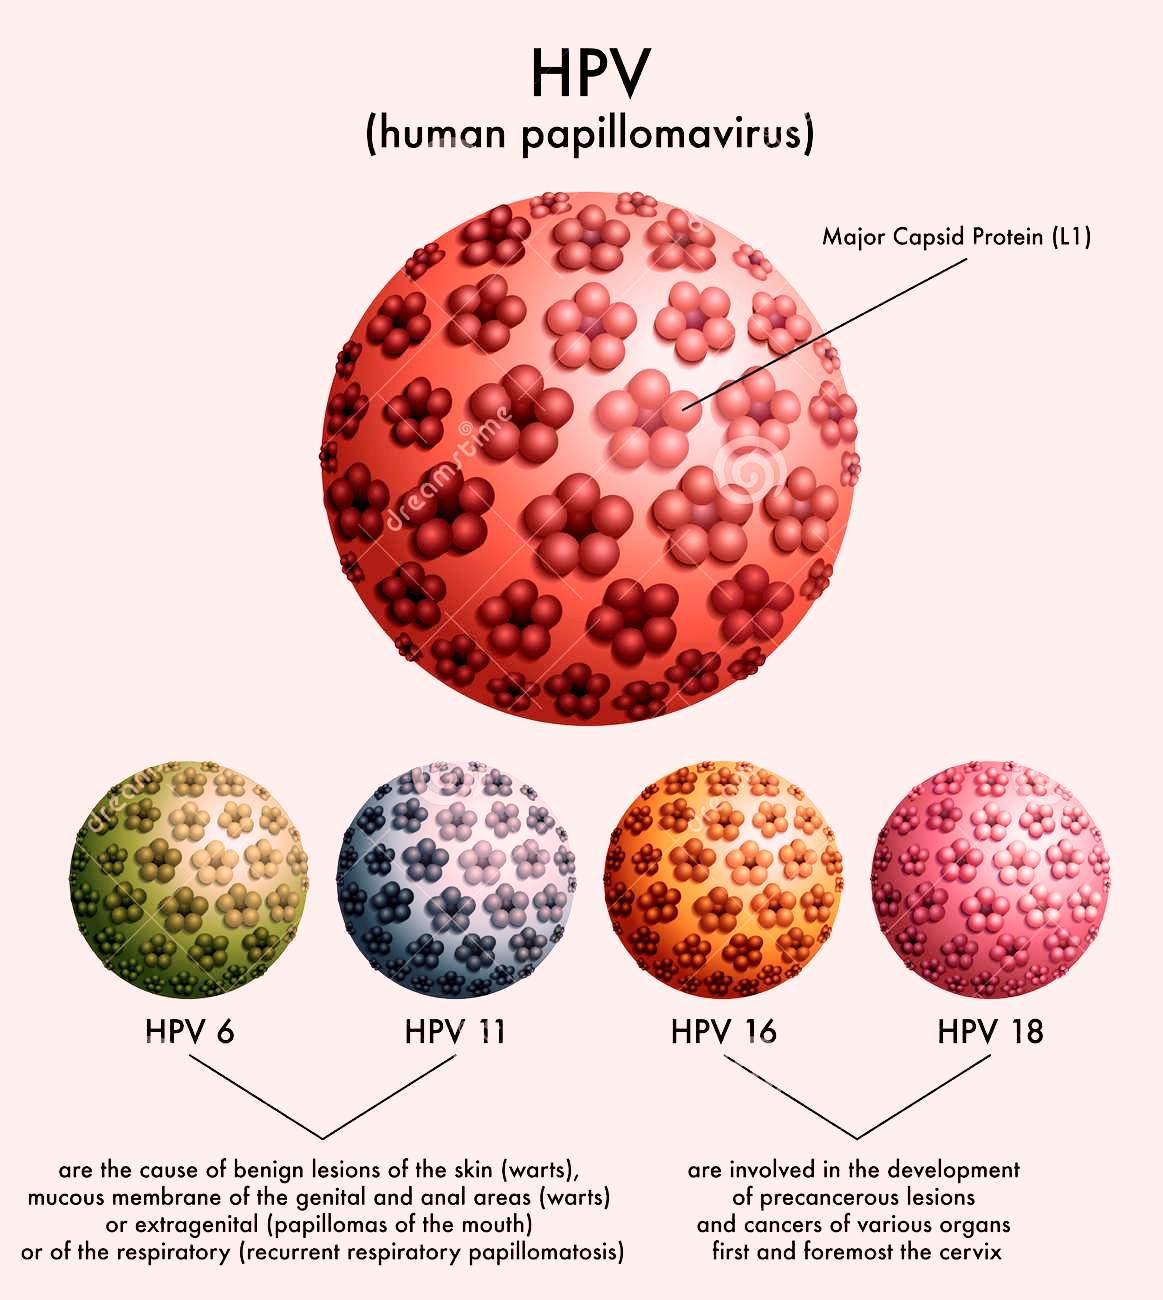 human papillomavirus and hiv